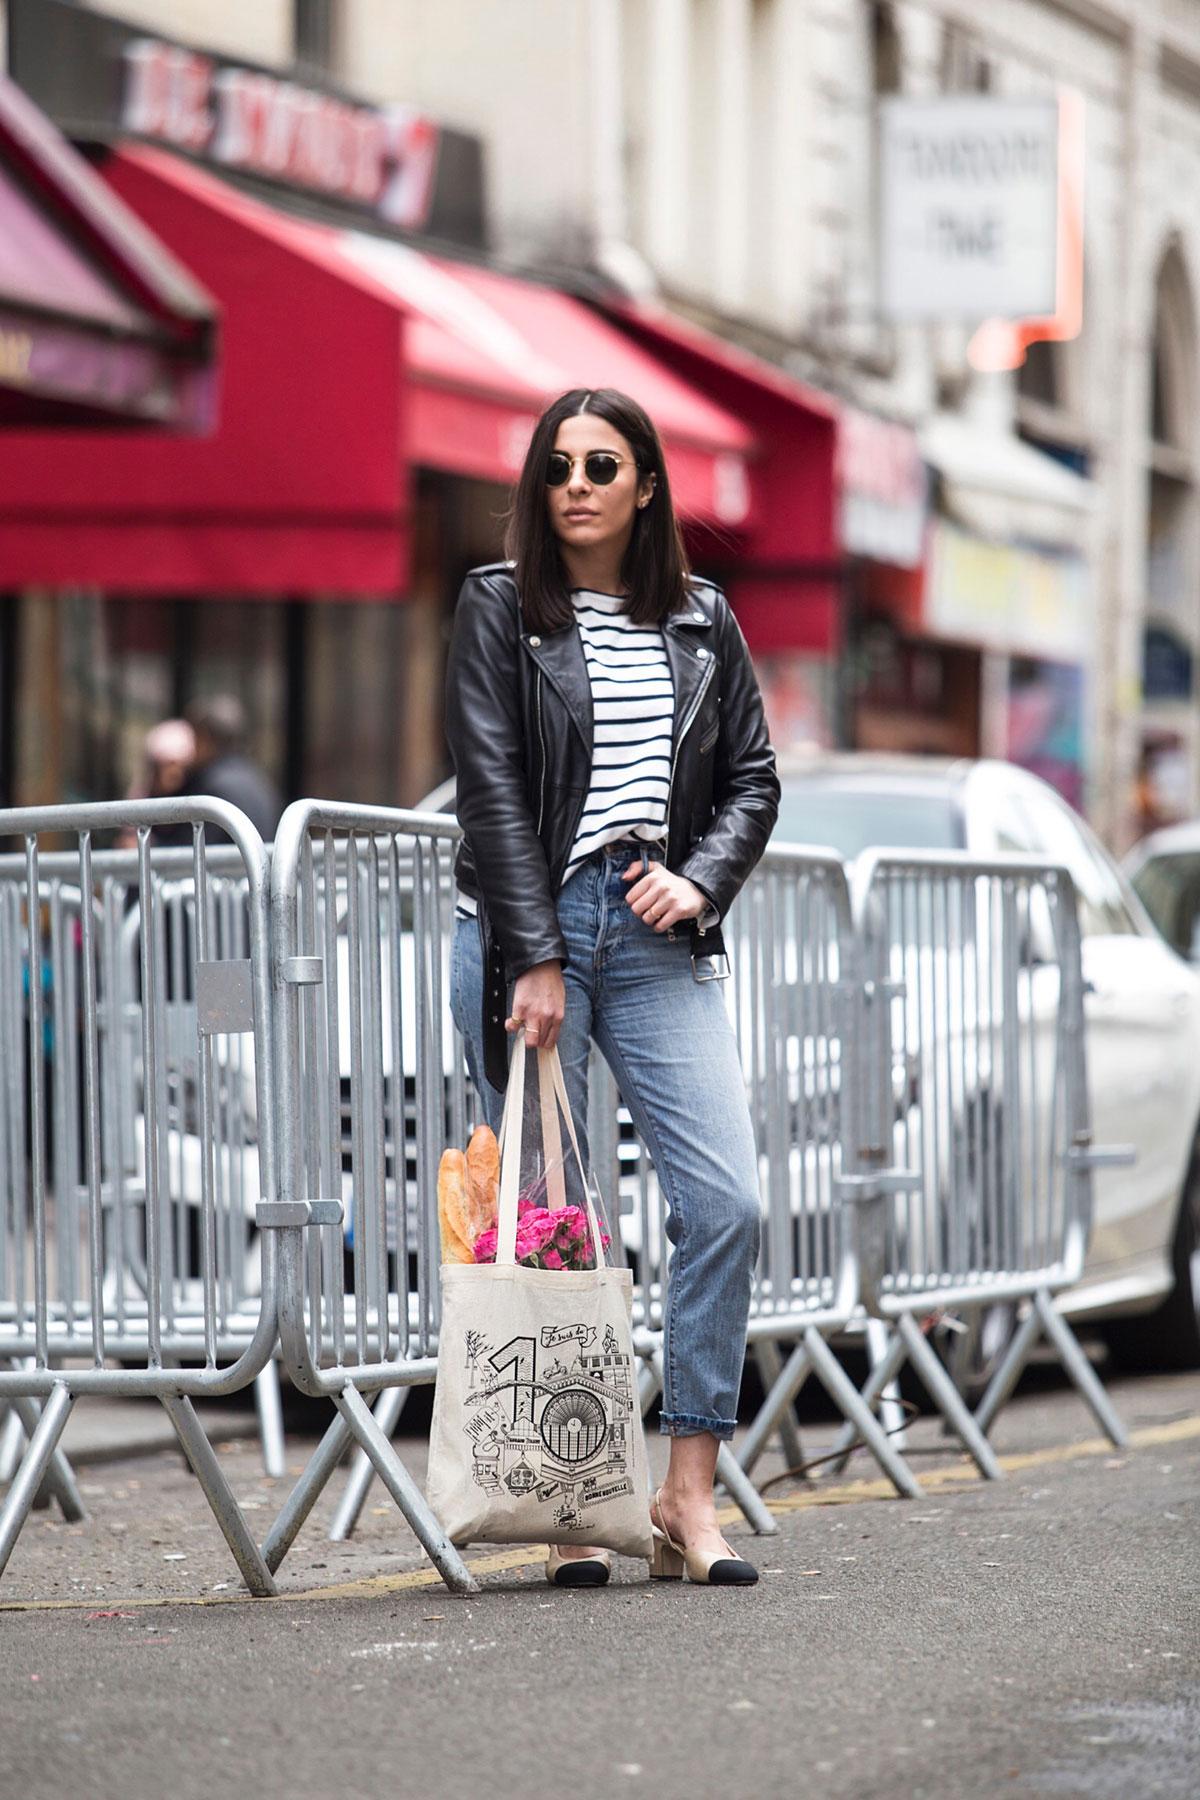 Breton Stripe Top & Jeans by Stella Asteria | Fashion & Lifestyle Blogger